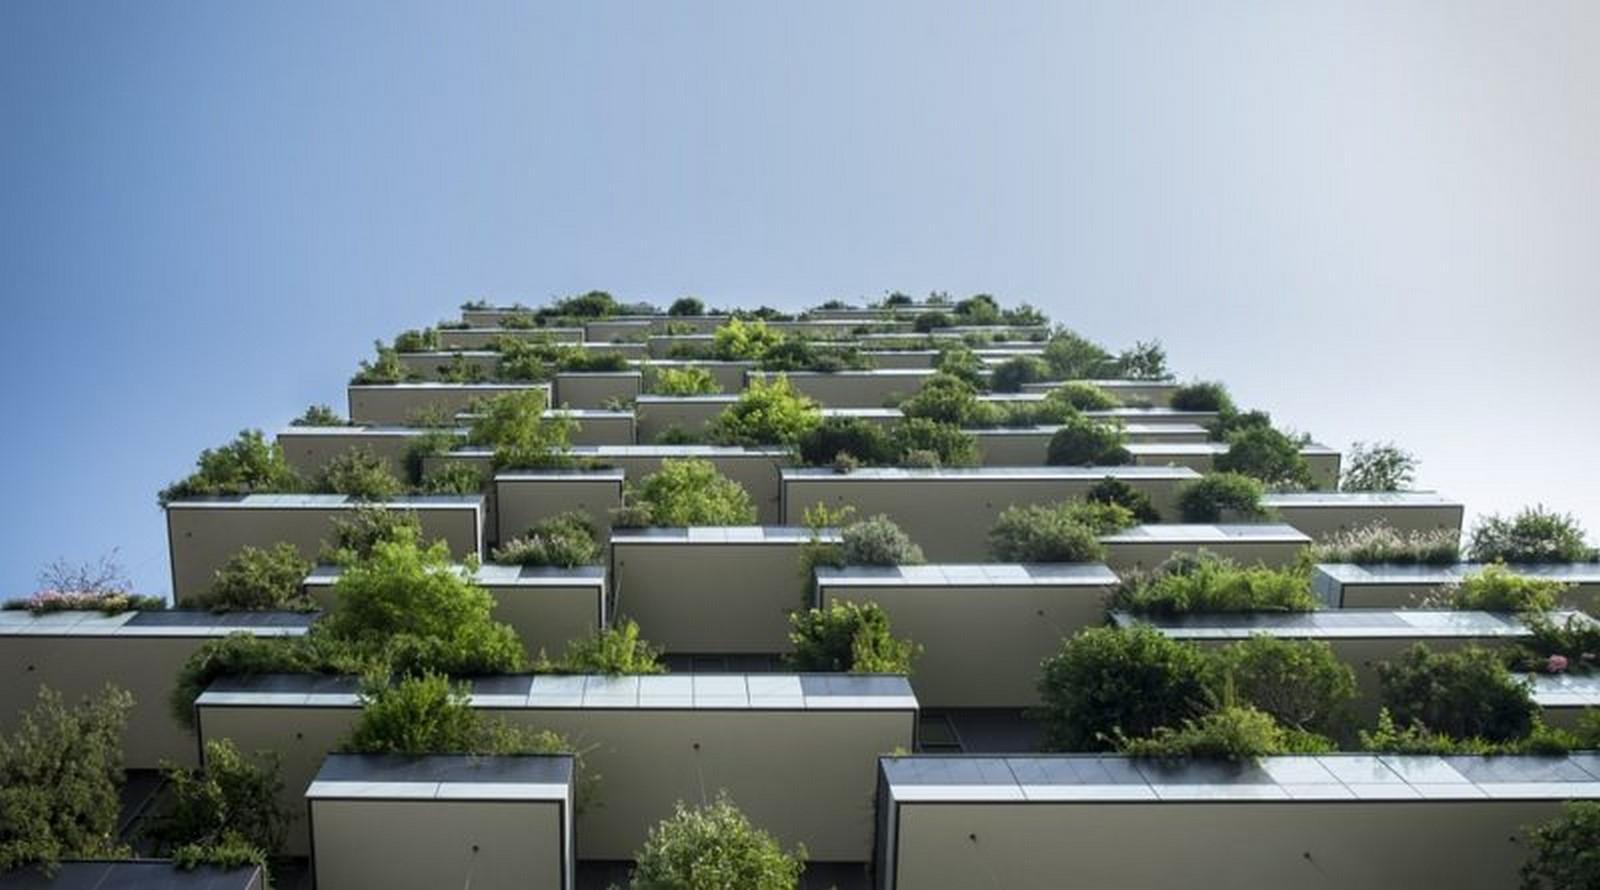 Architects vs Global Warming - Sheet1